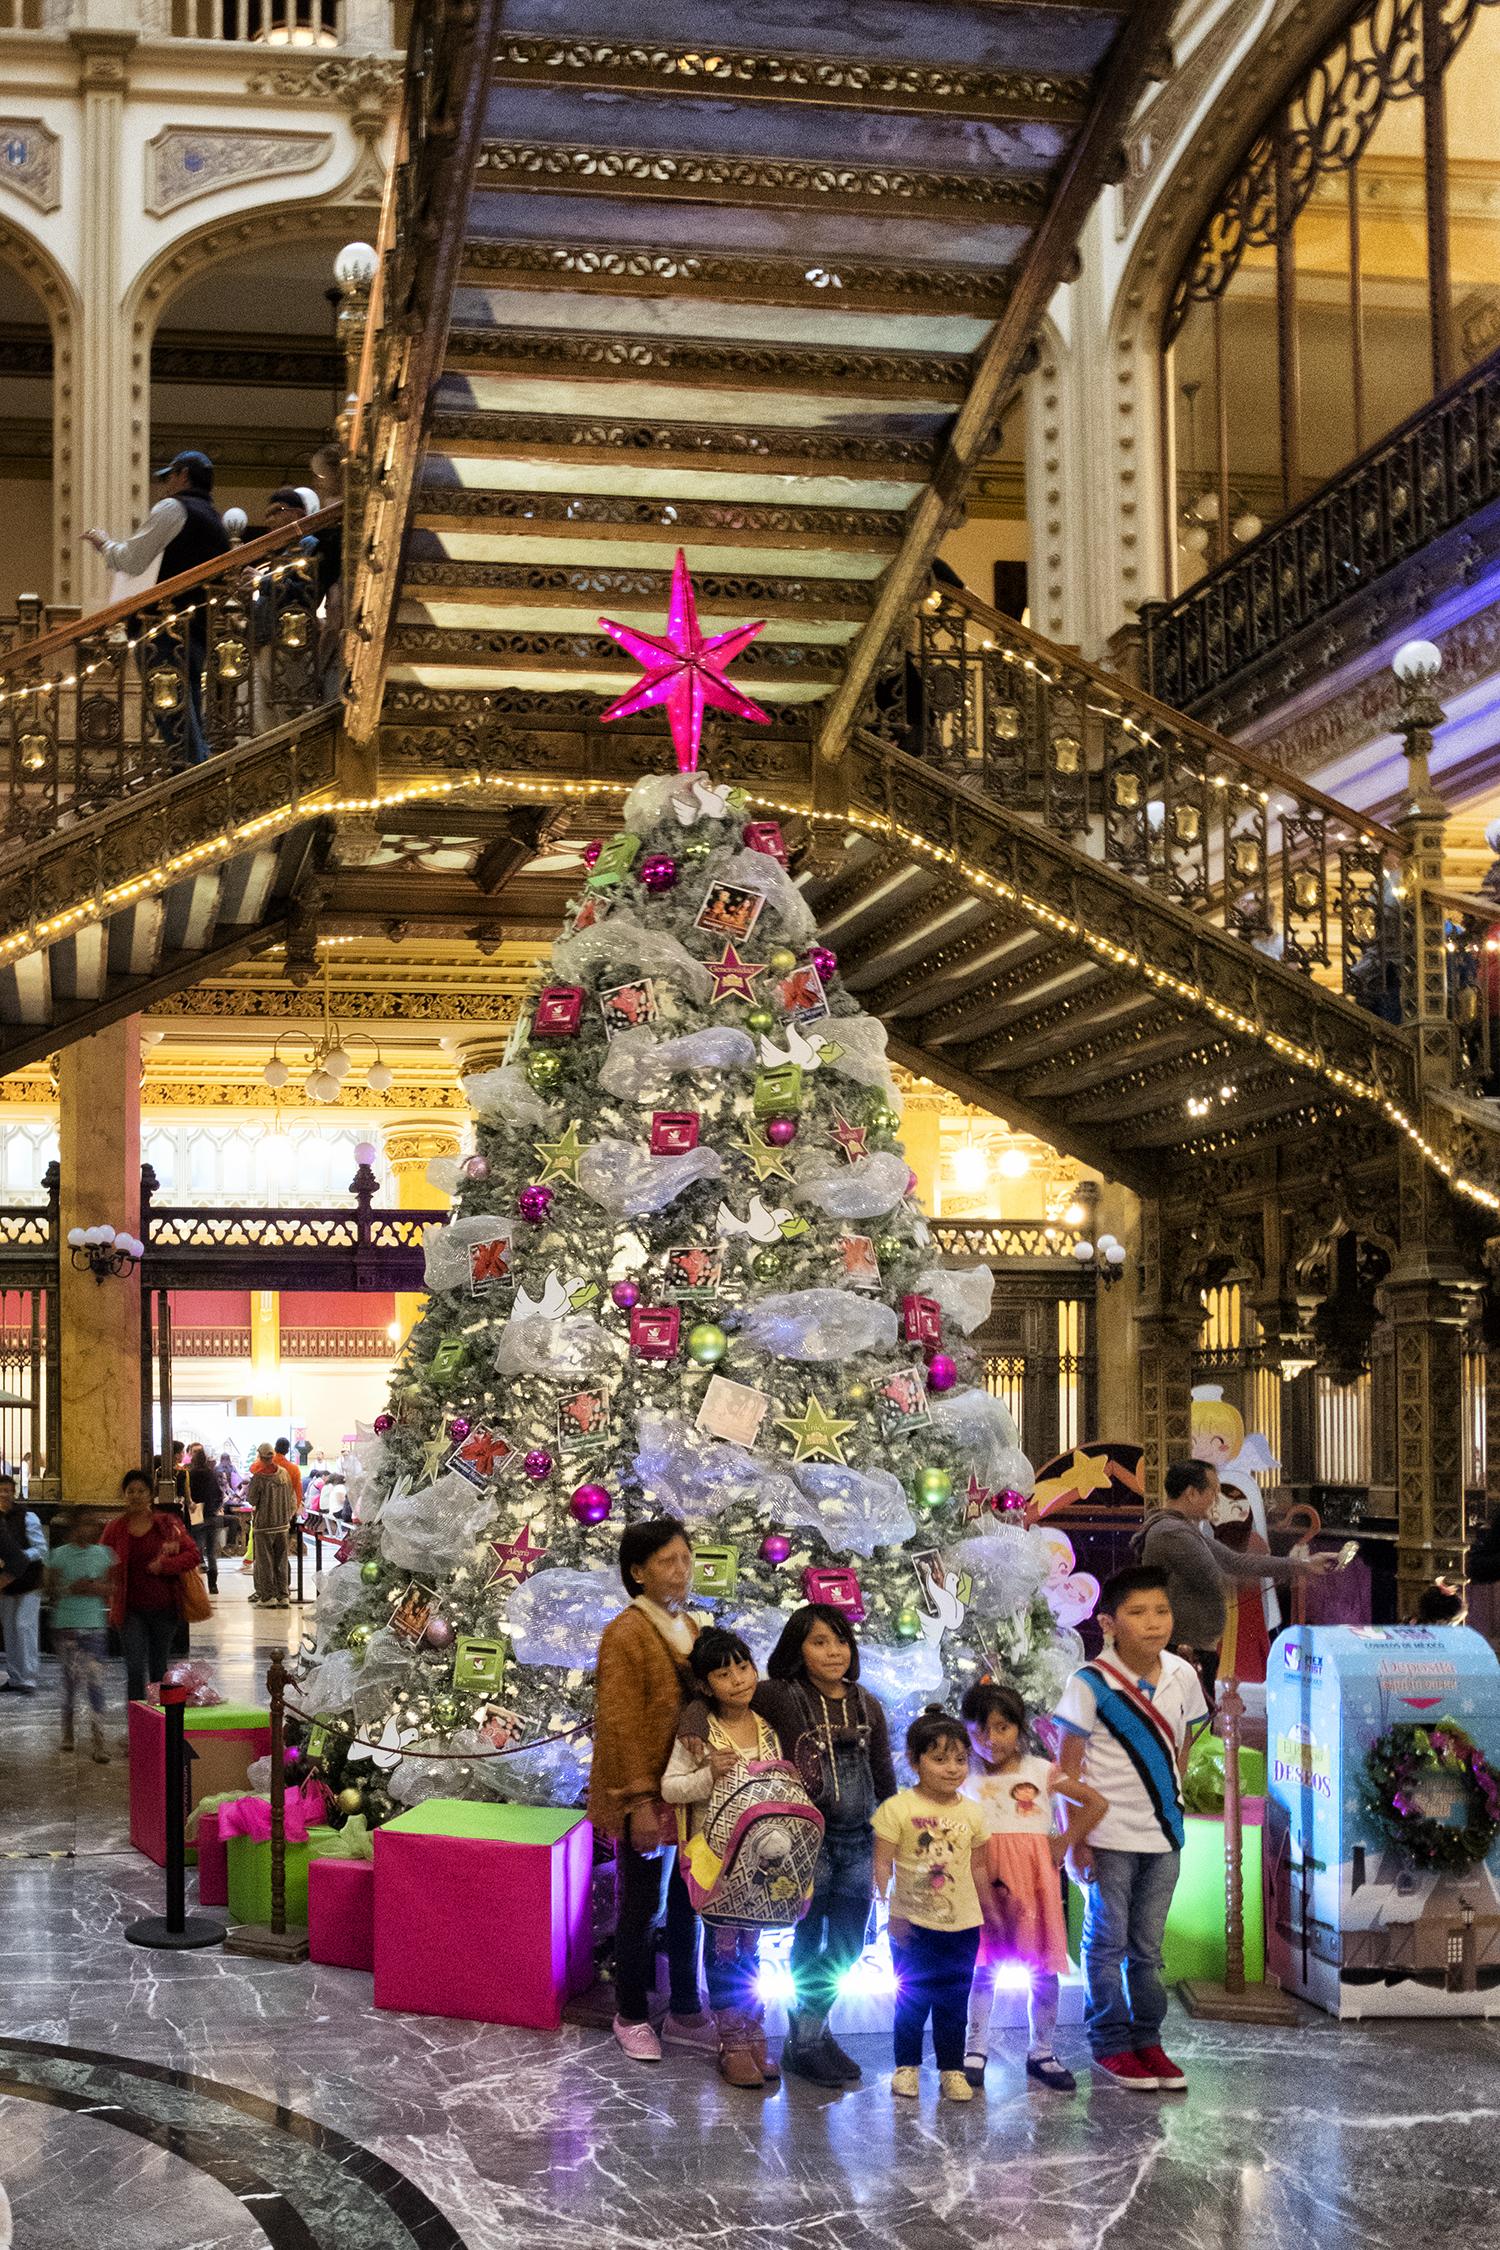 Inside the Palacio Postal, Mexico City